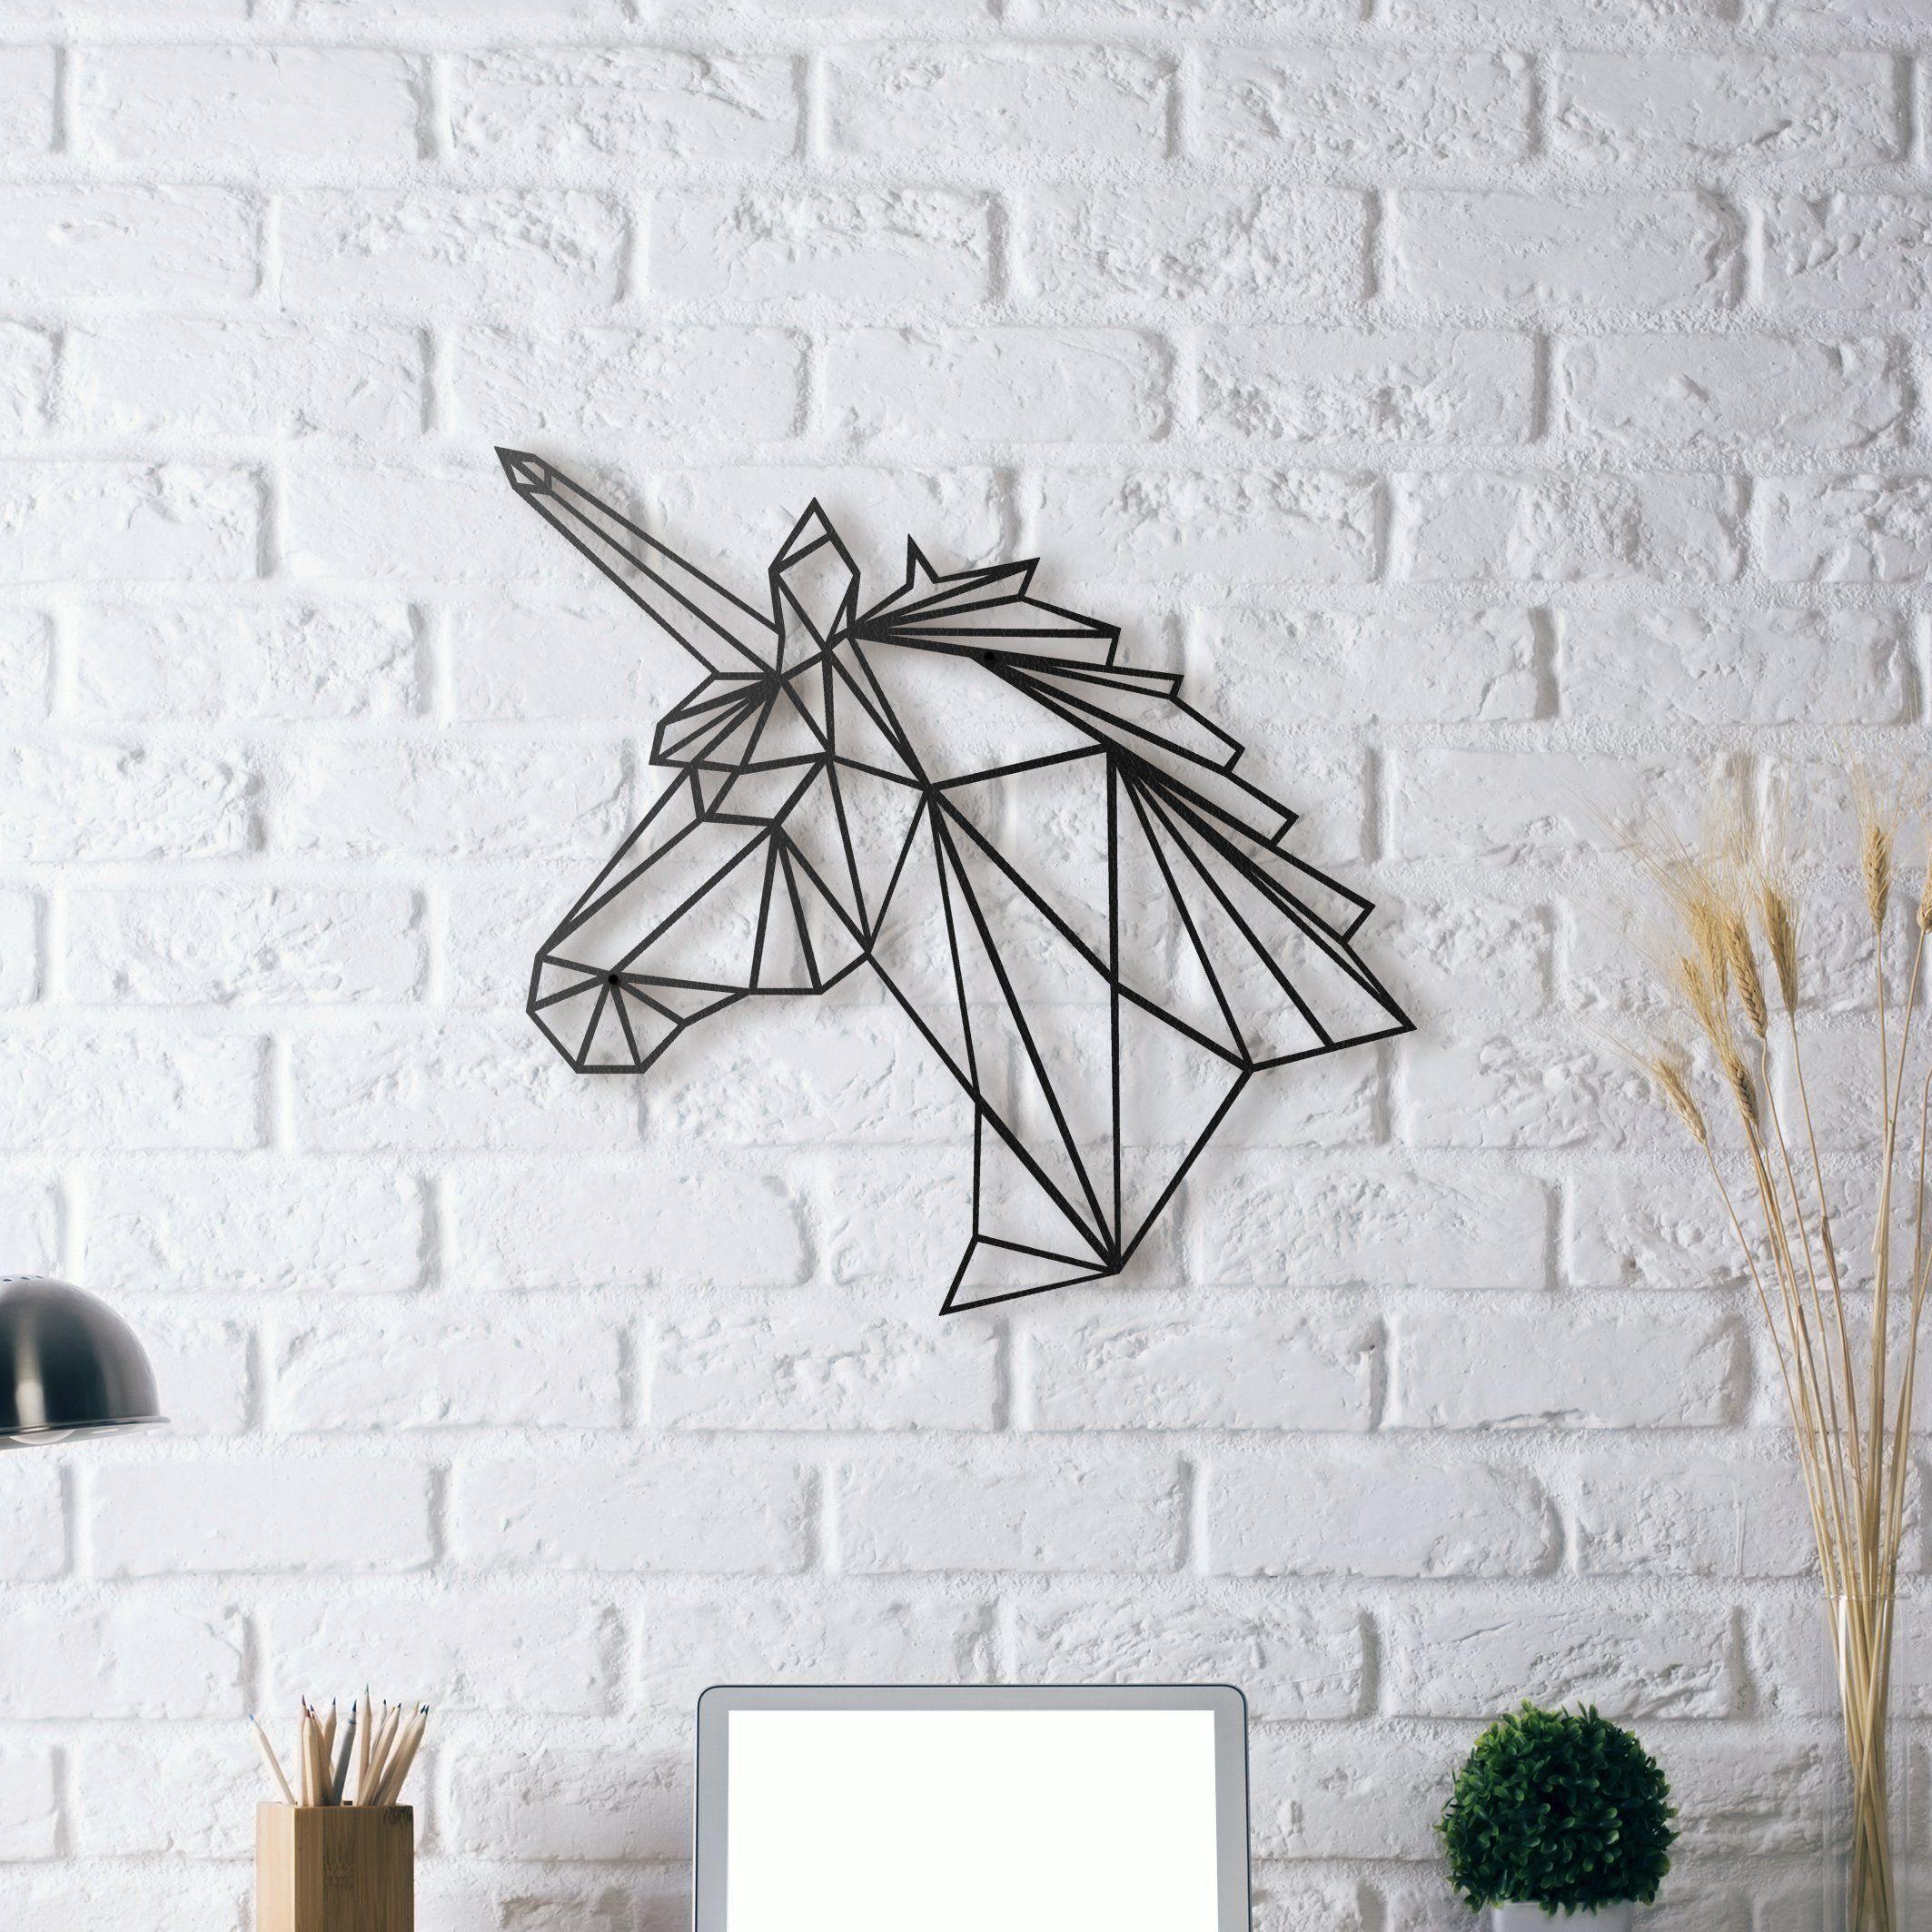 Unicorn metal wall art metal wall art metal walls and unicorns